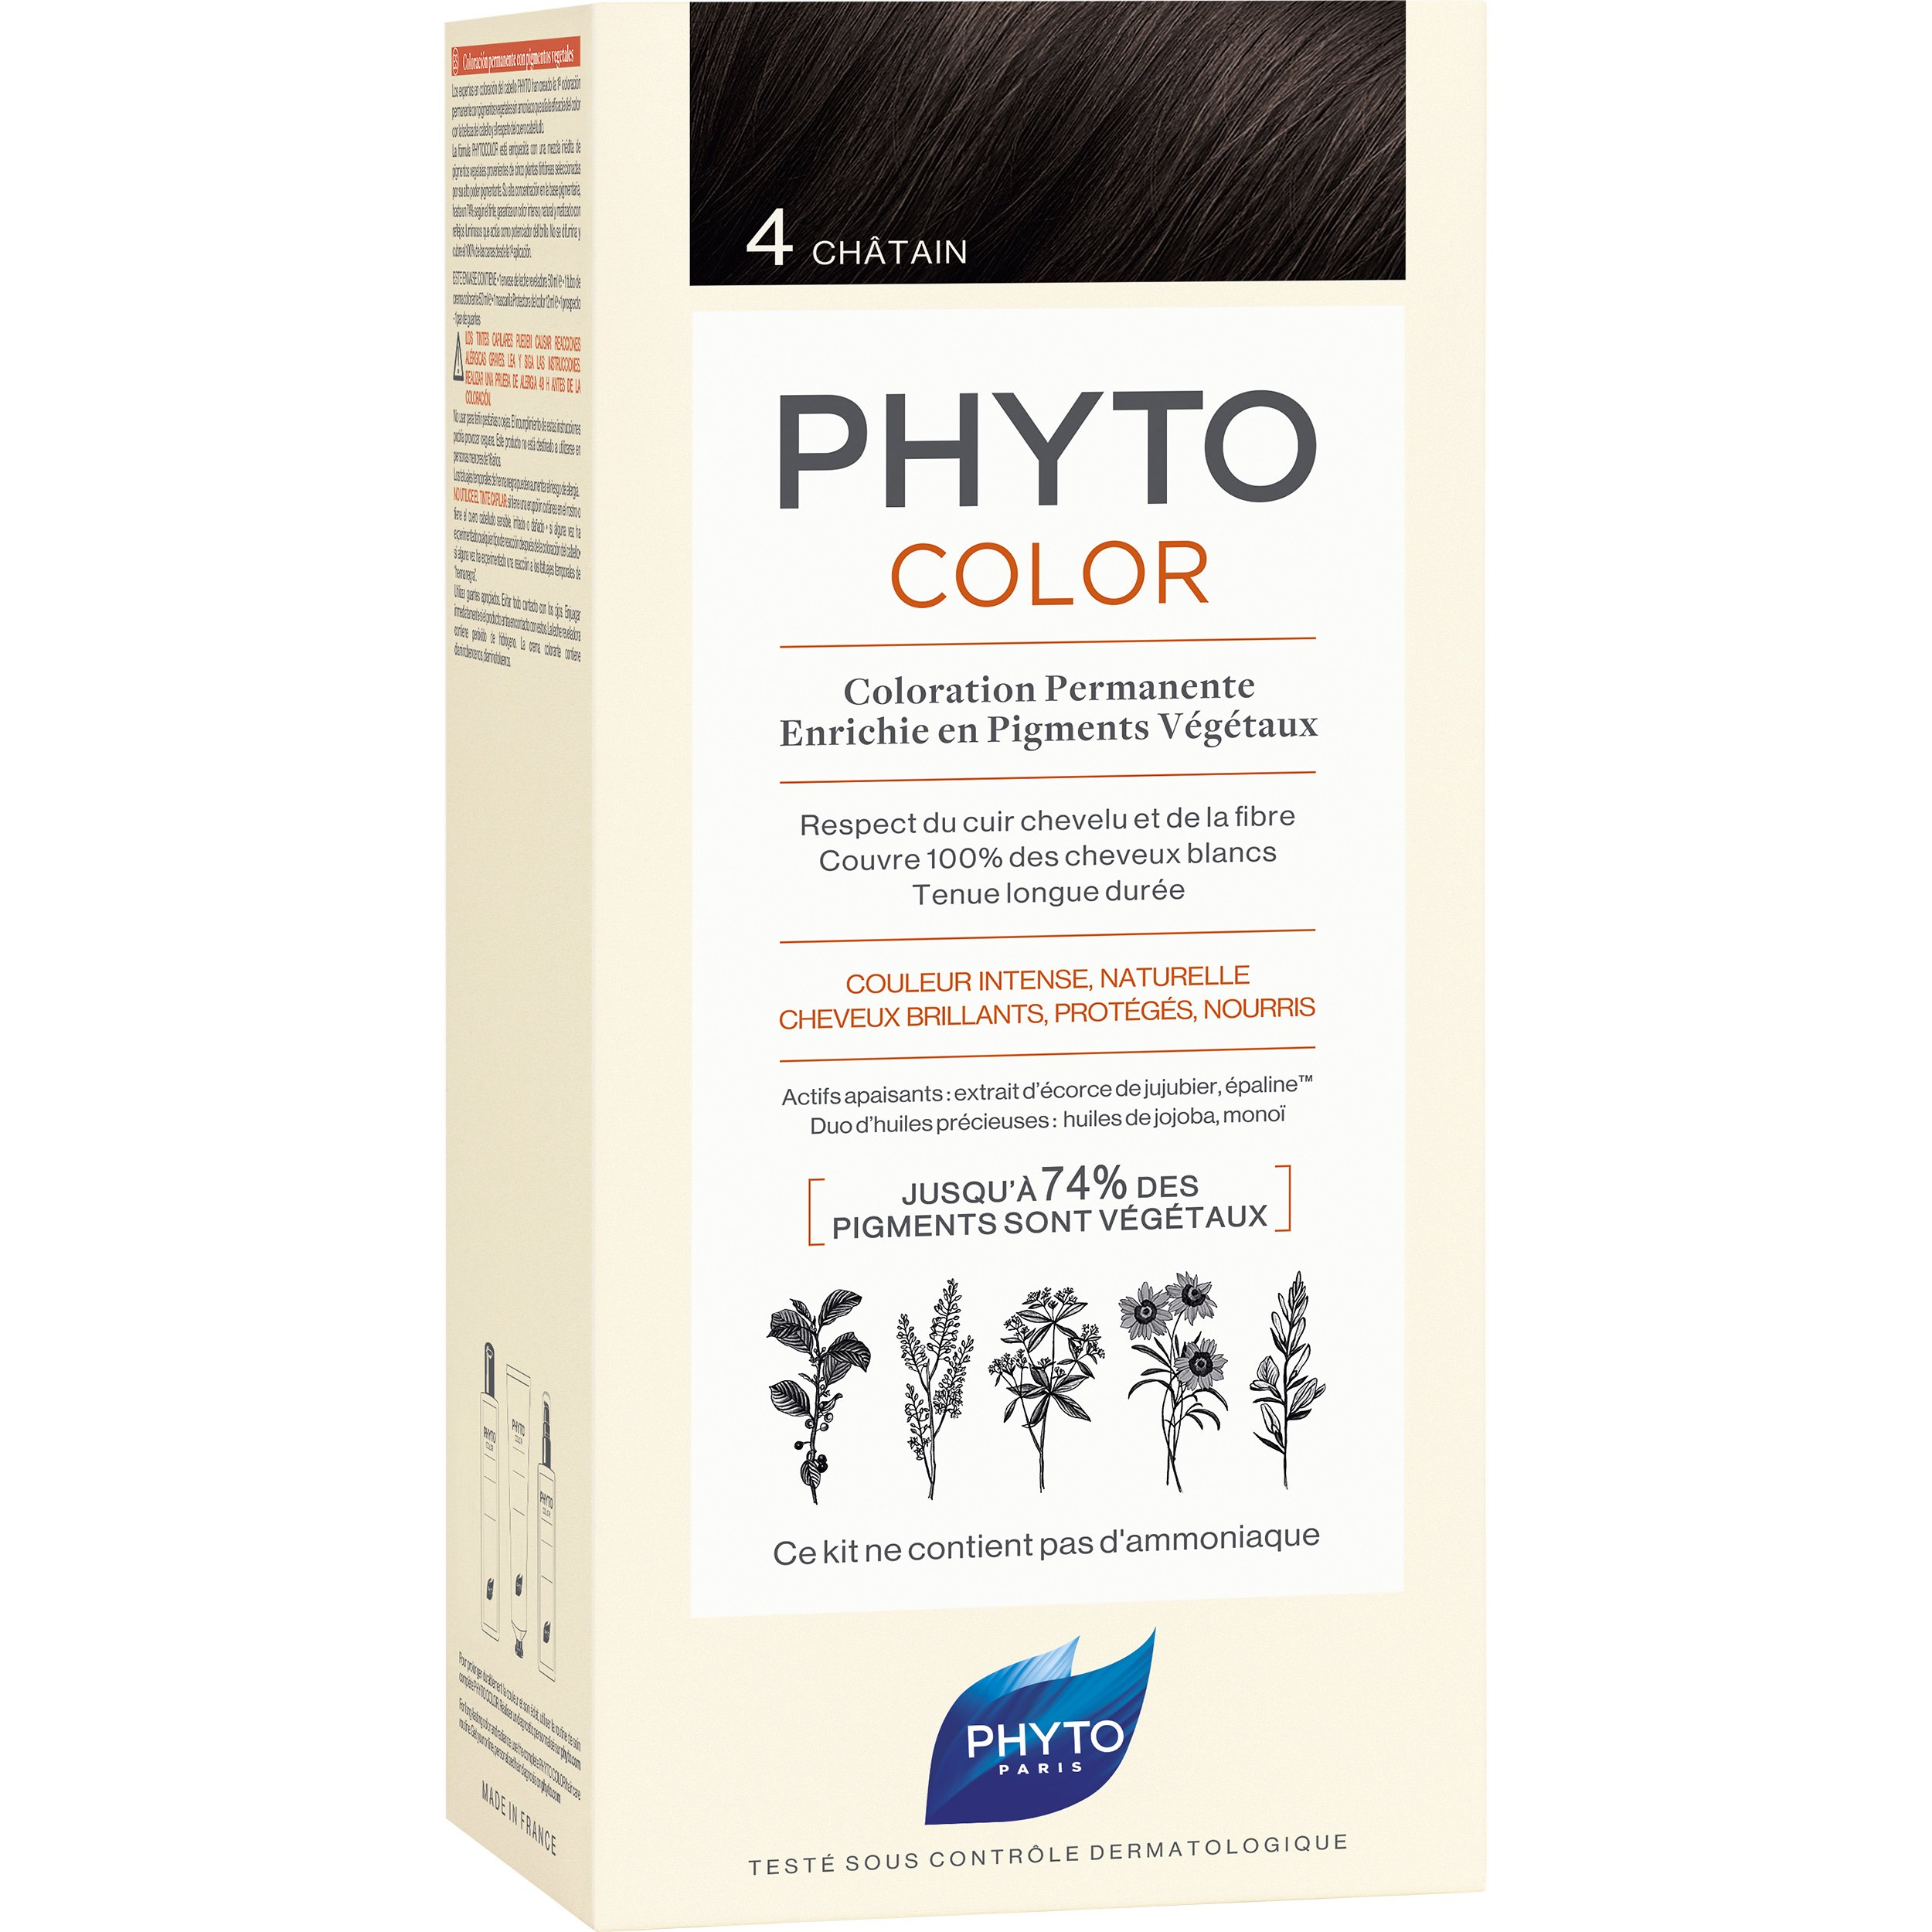 Phyto PhytoColor Coloration Permanente η No1 Μόνιμη Βαφή Μαλλιών Χωρίς Χρωστικές Ουσίες & Αμμωνία – 4 Καστανό